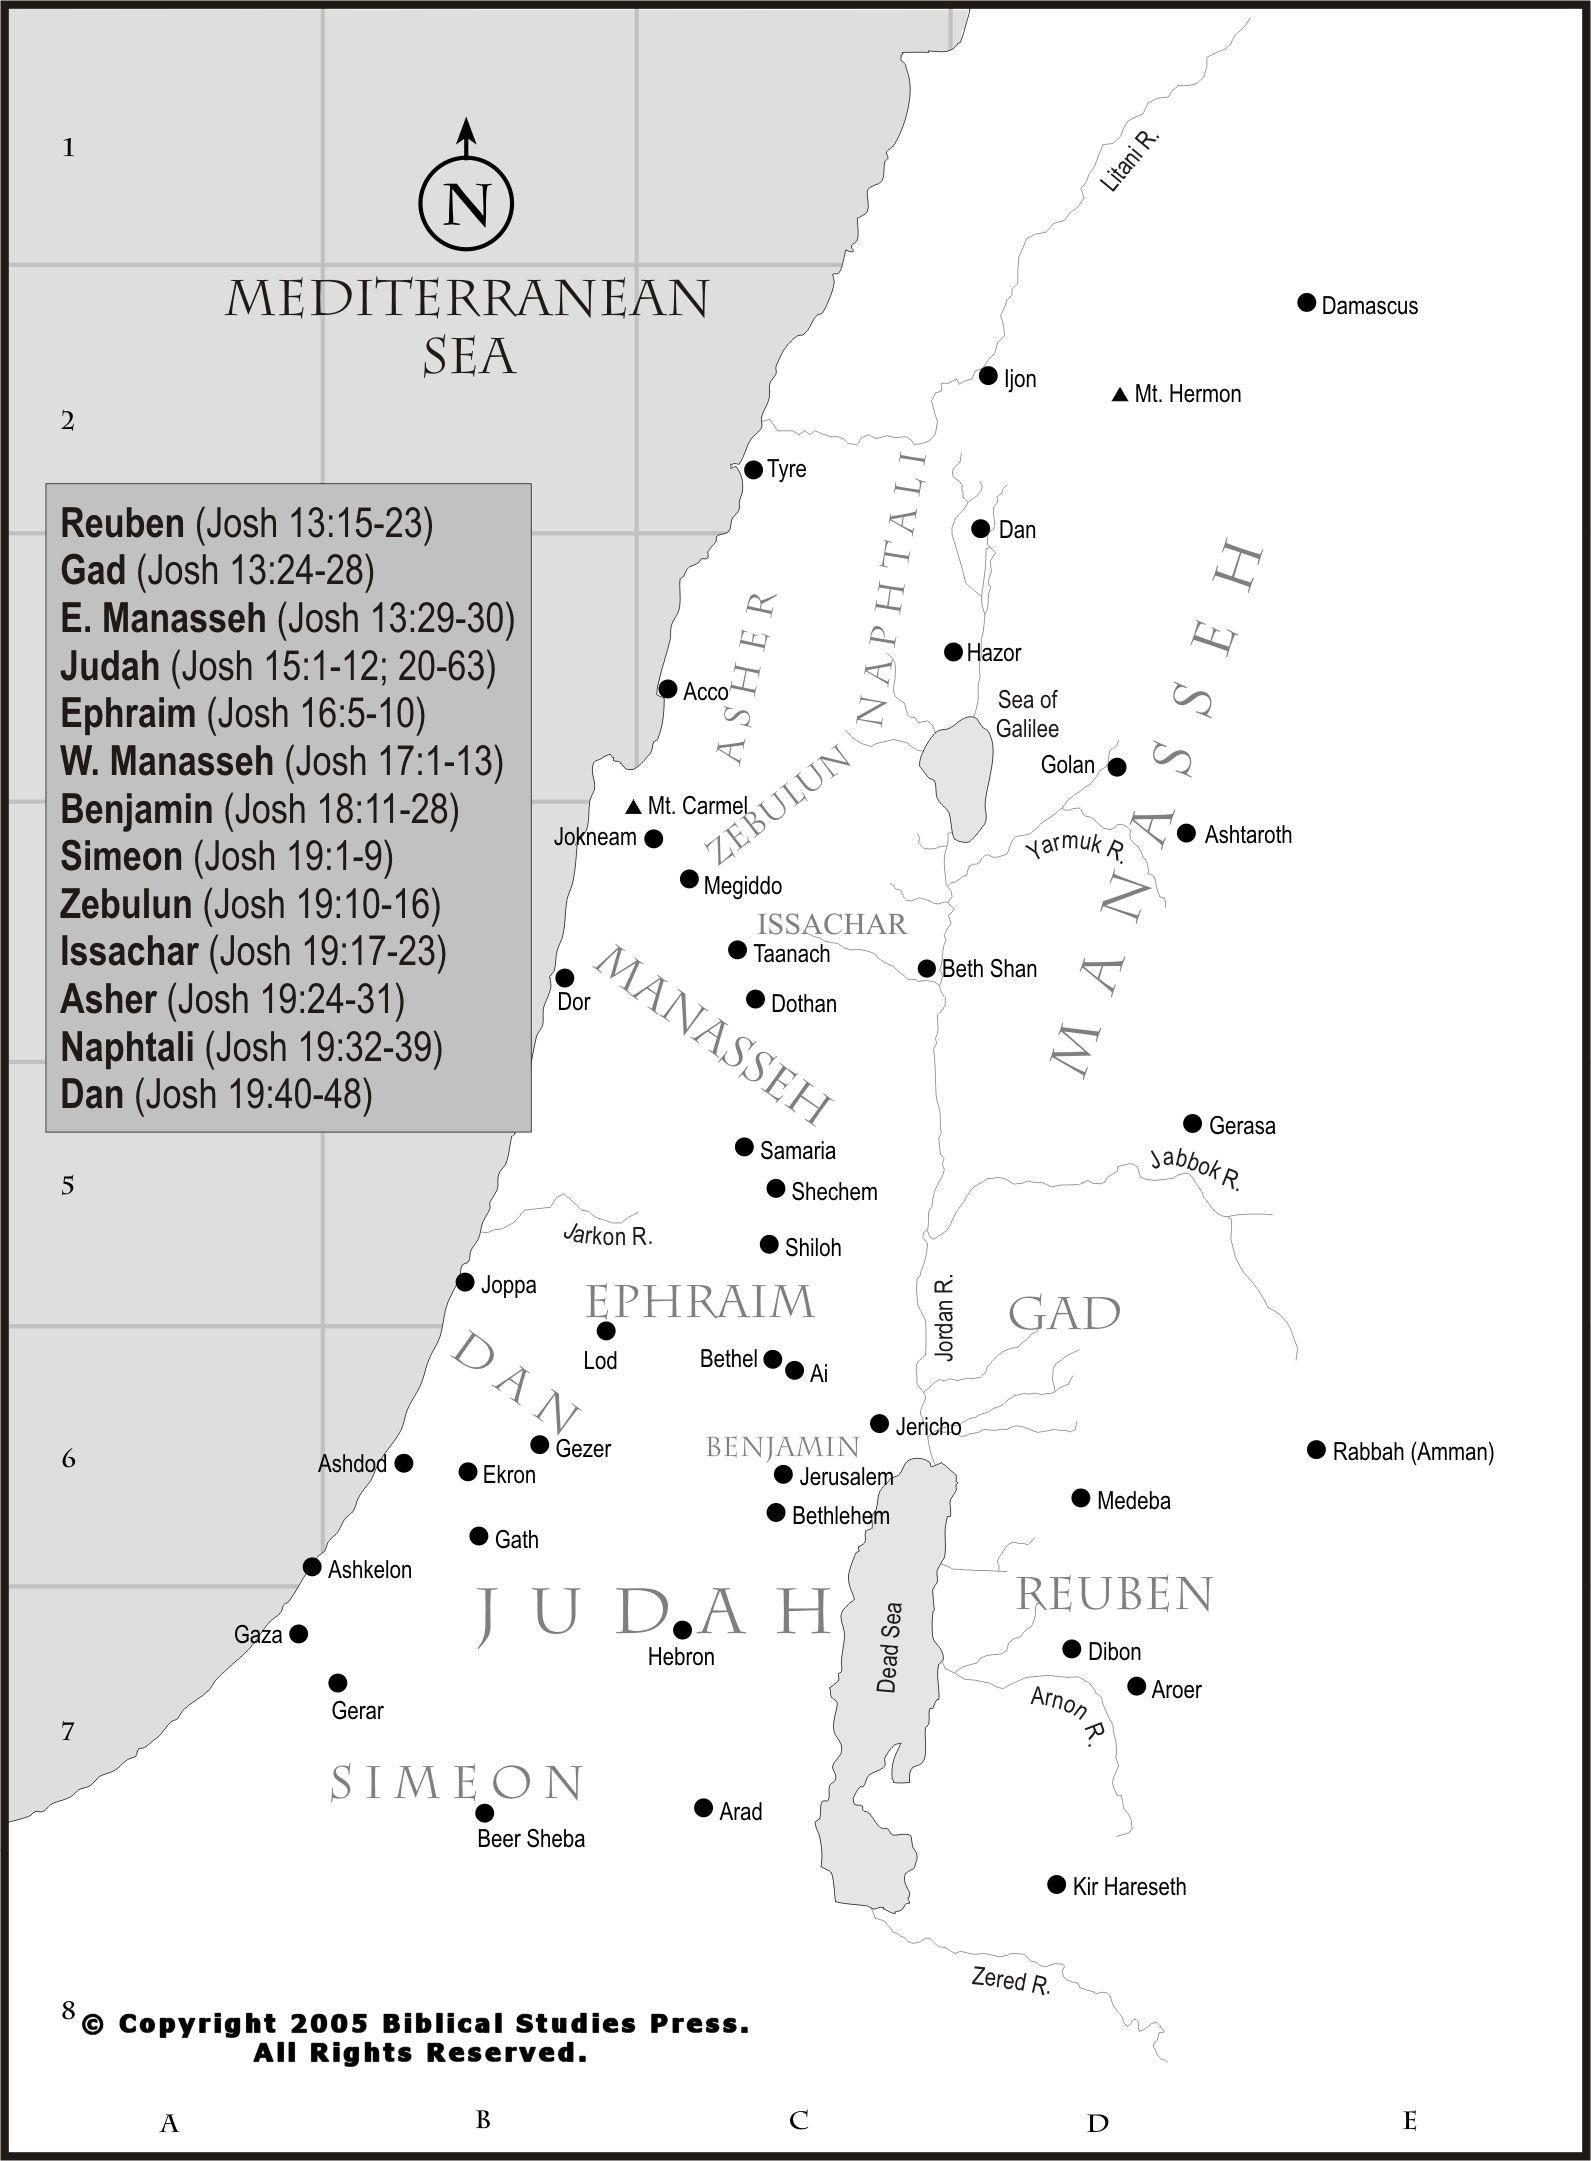 12 Tribes Location